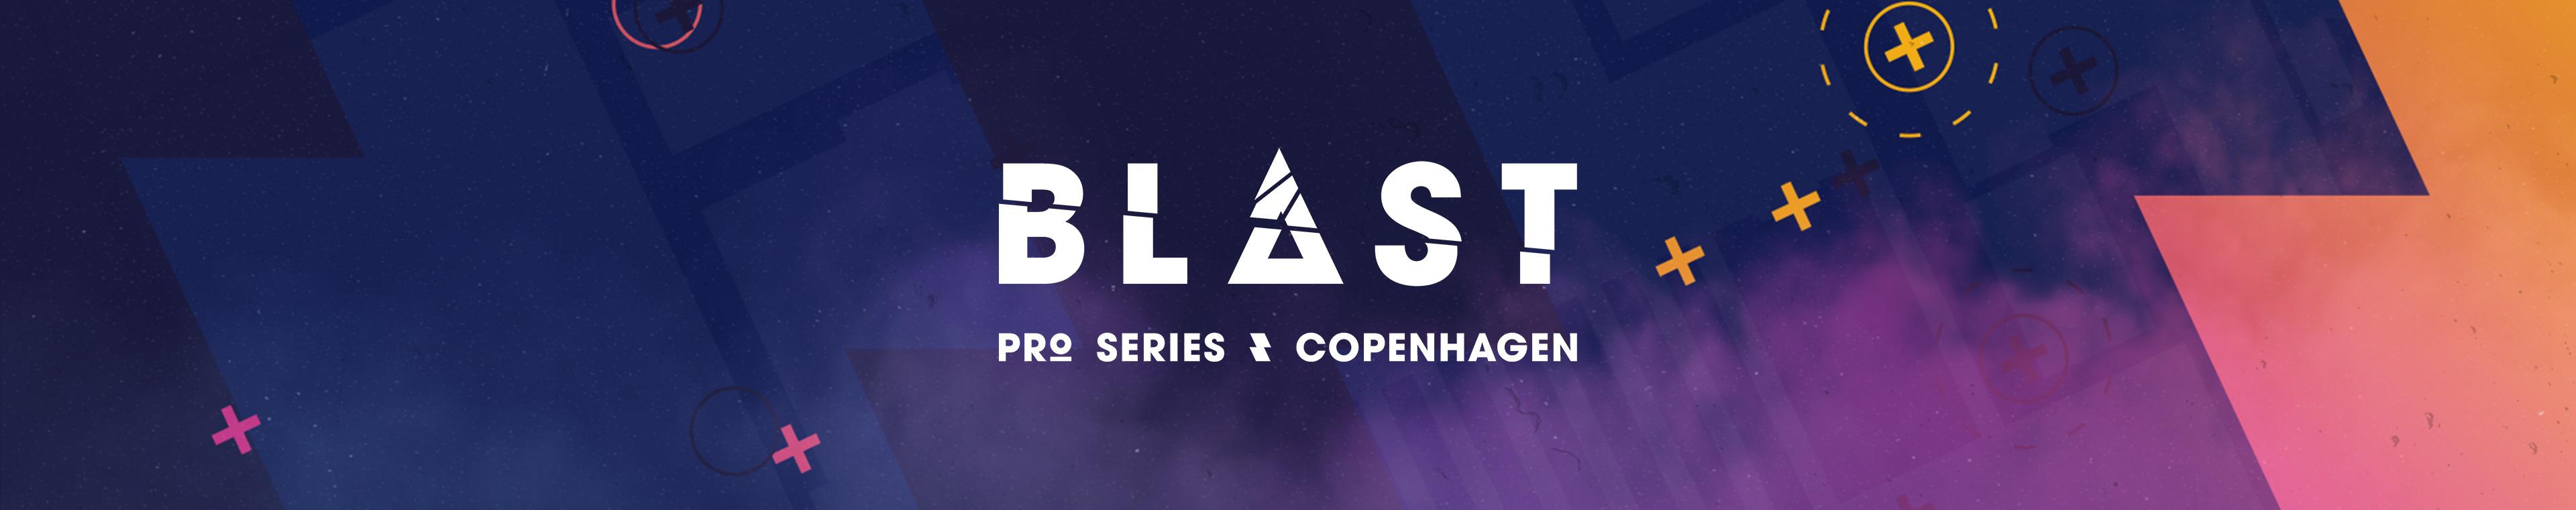 BLAST Pro Series: Copenhagen 2019